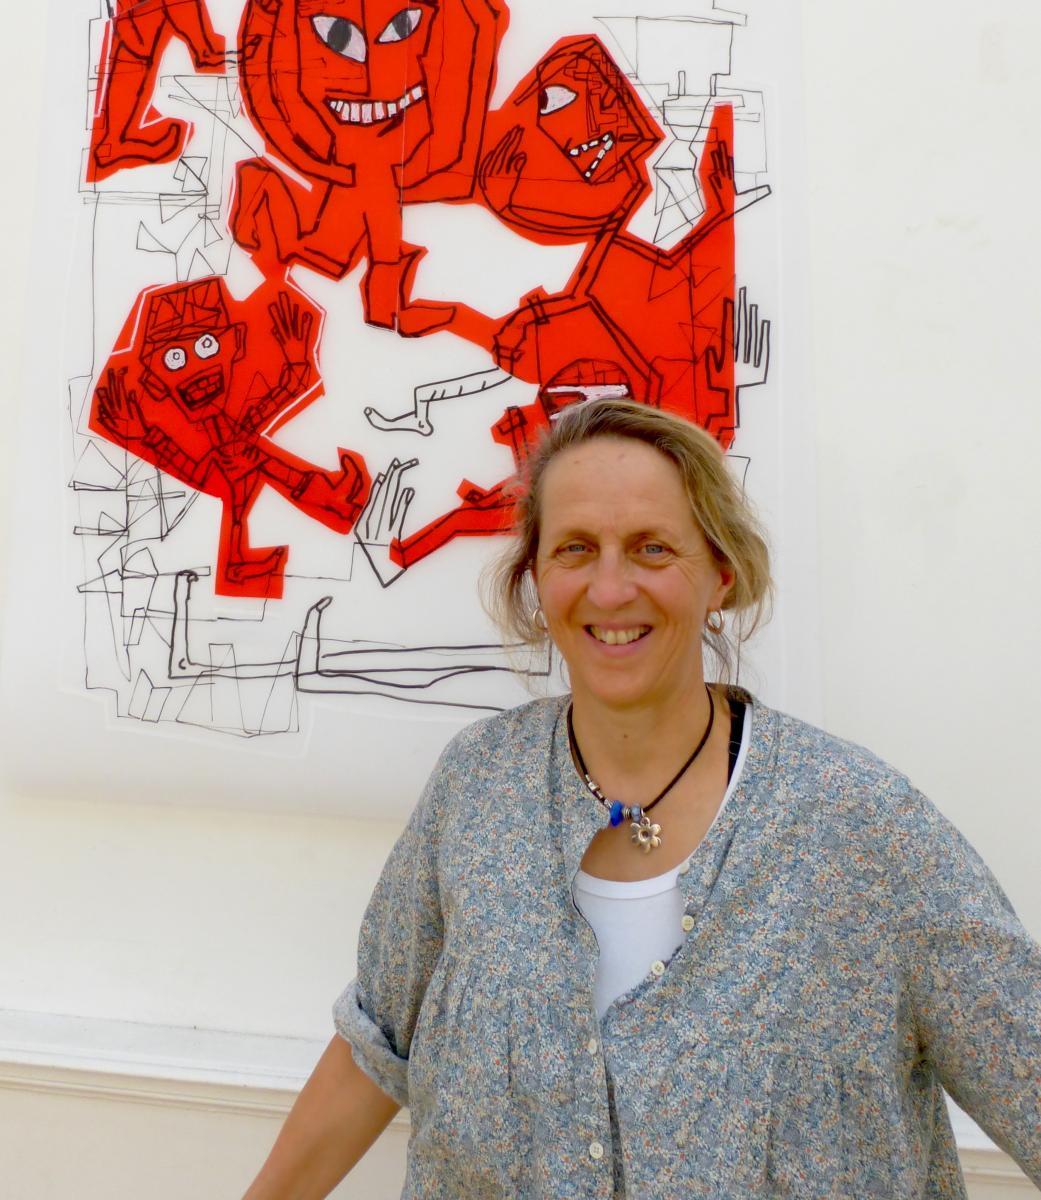 Caroline Veith